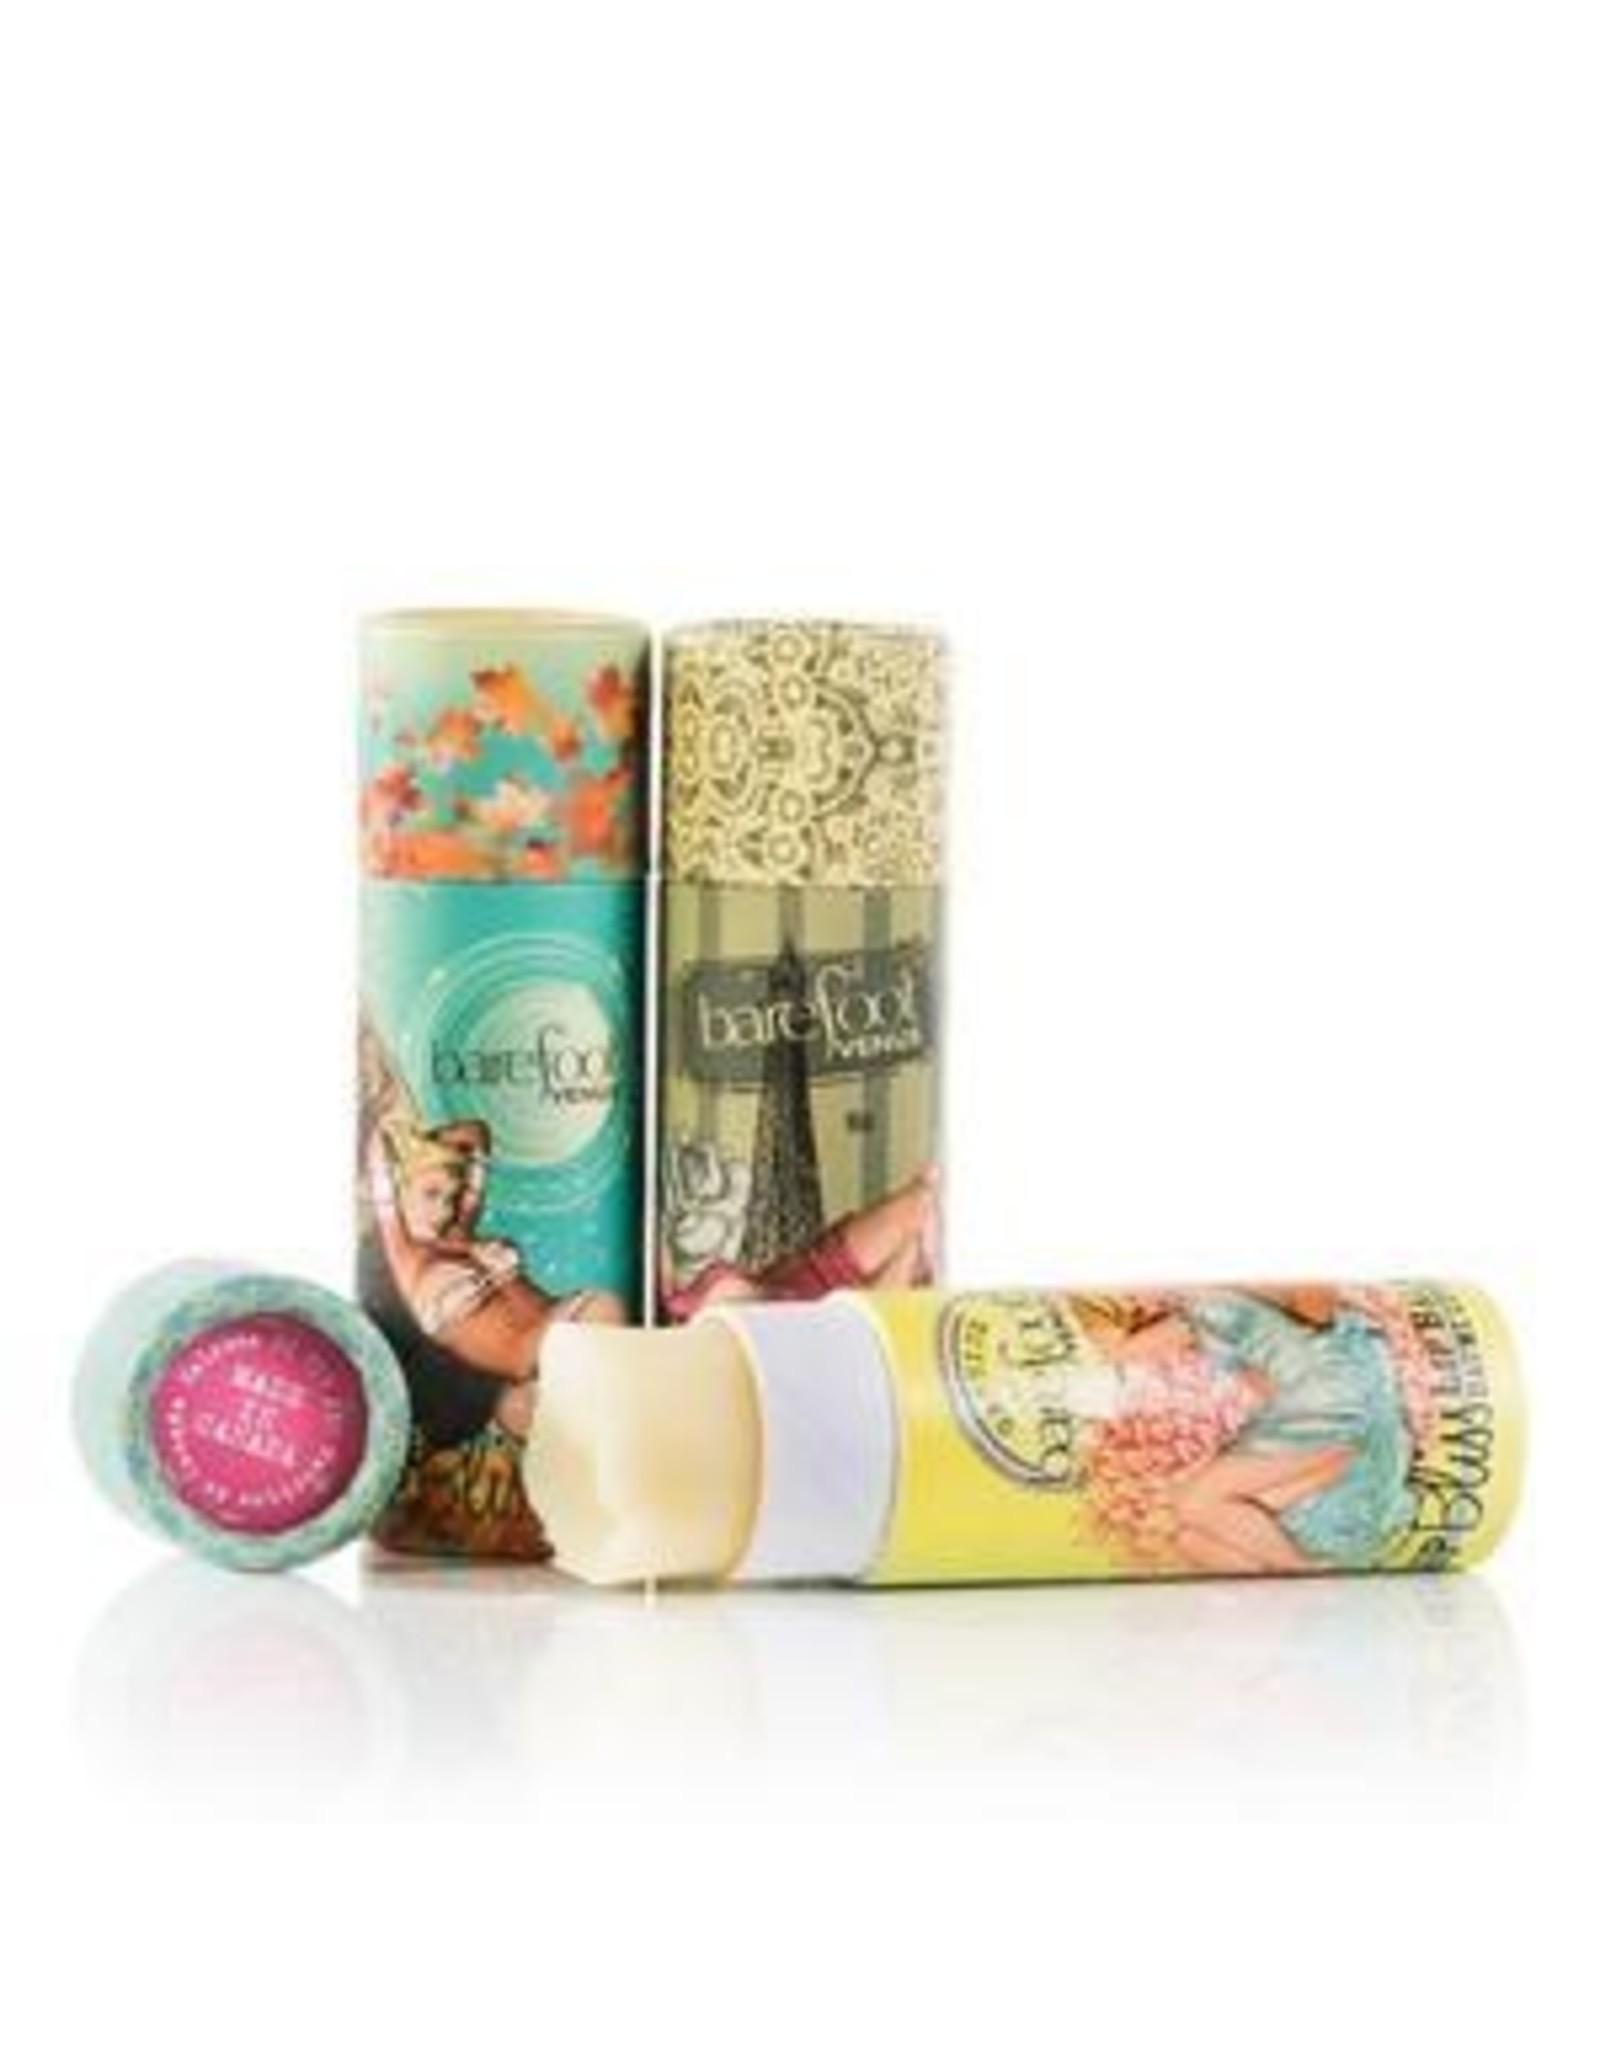 Barefoot Venus Barefoot Venus - Lip Bliss lip balm (4 flavours)